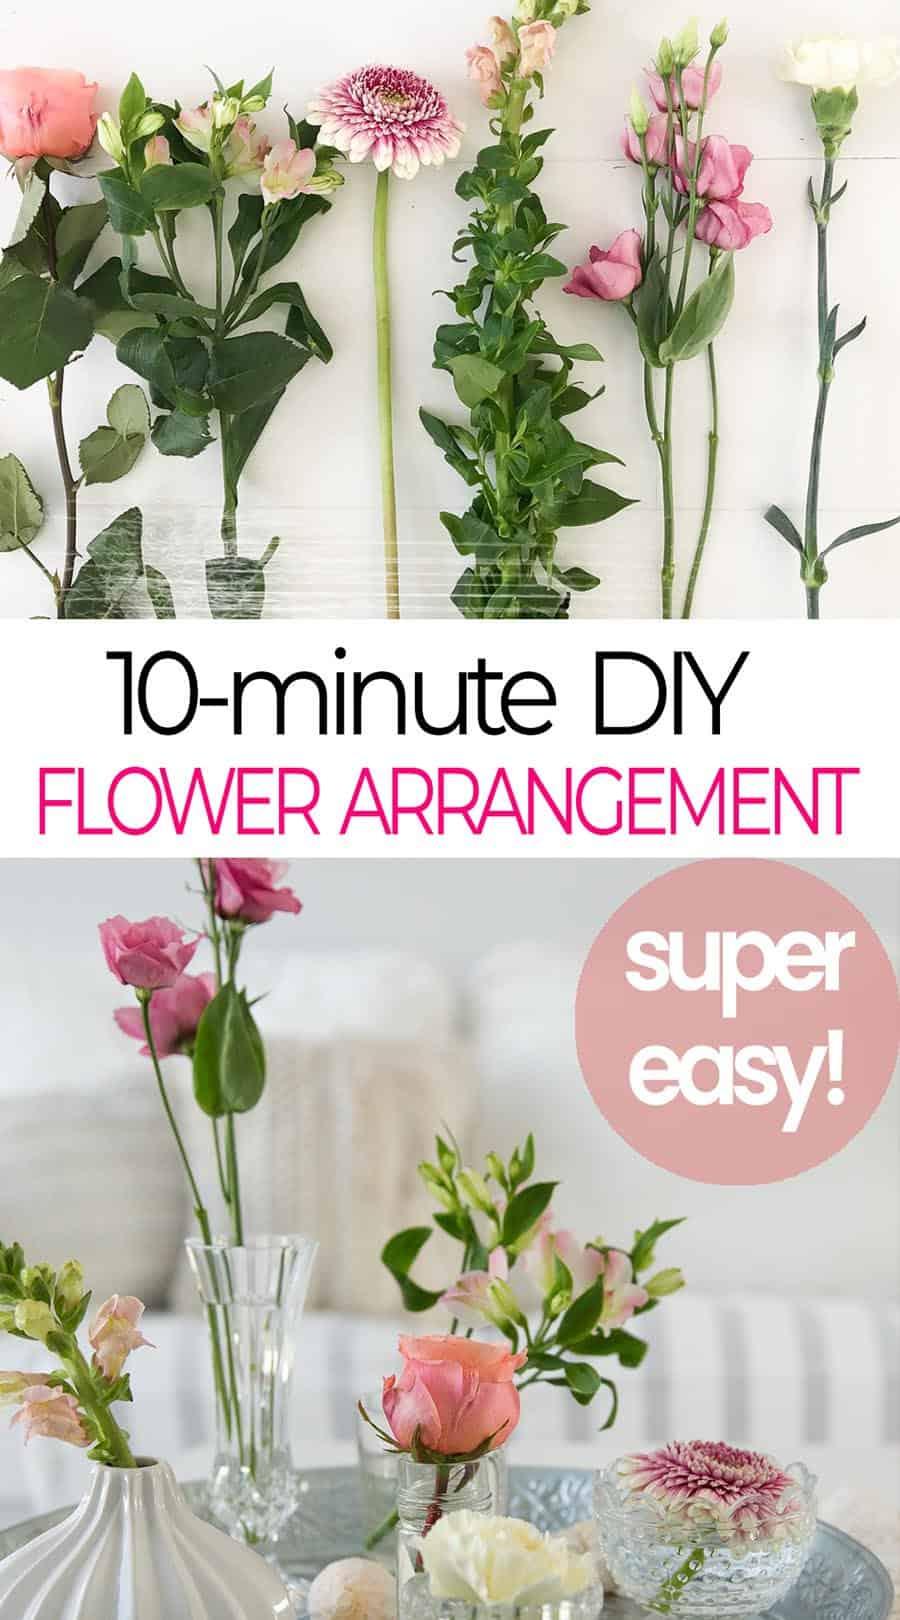 10 minute dia flower arrangement idea